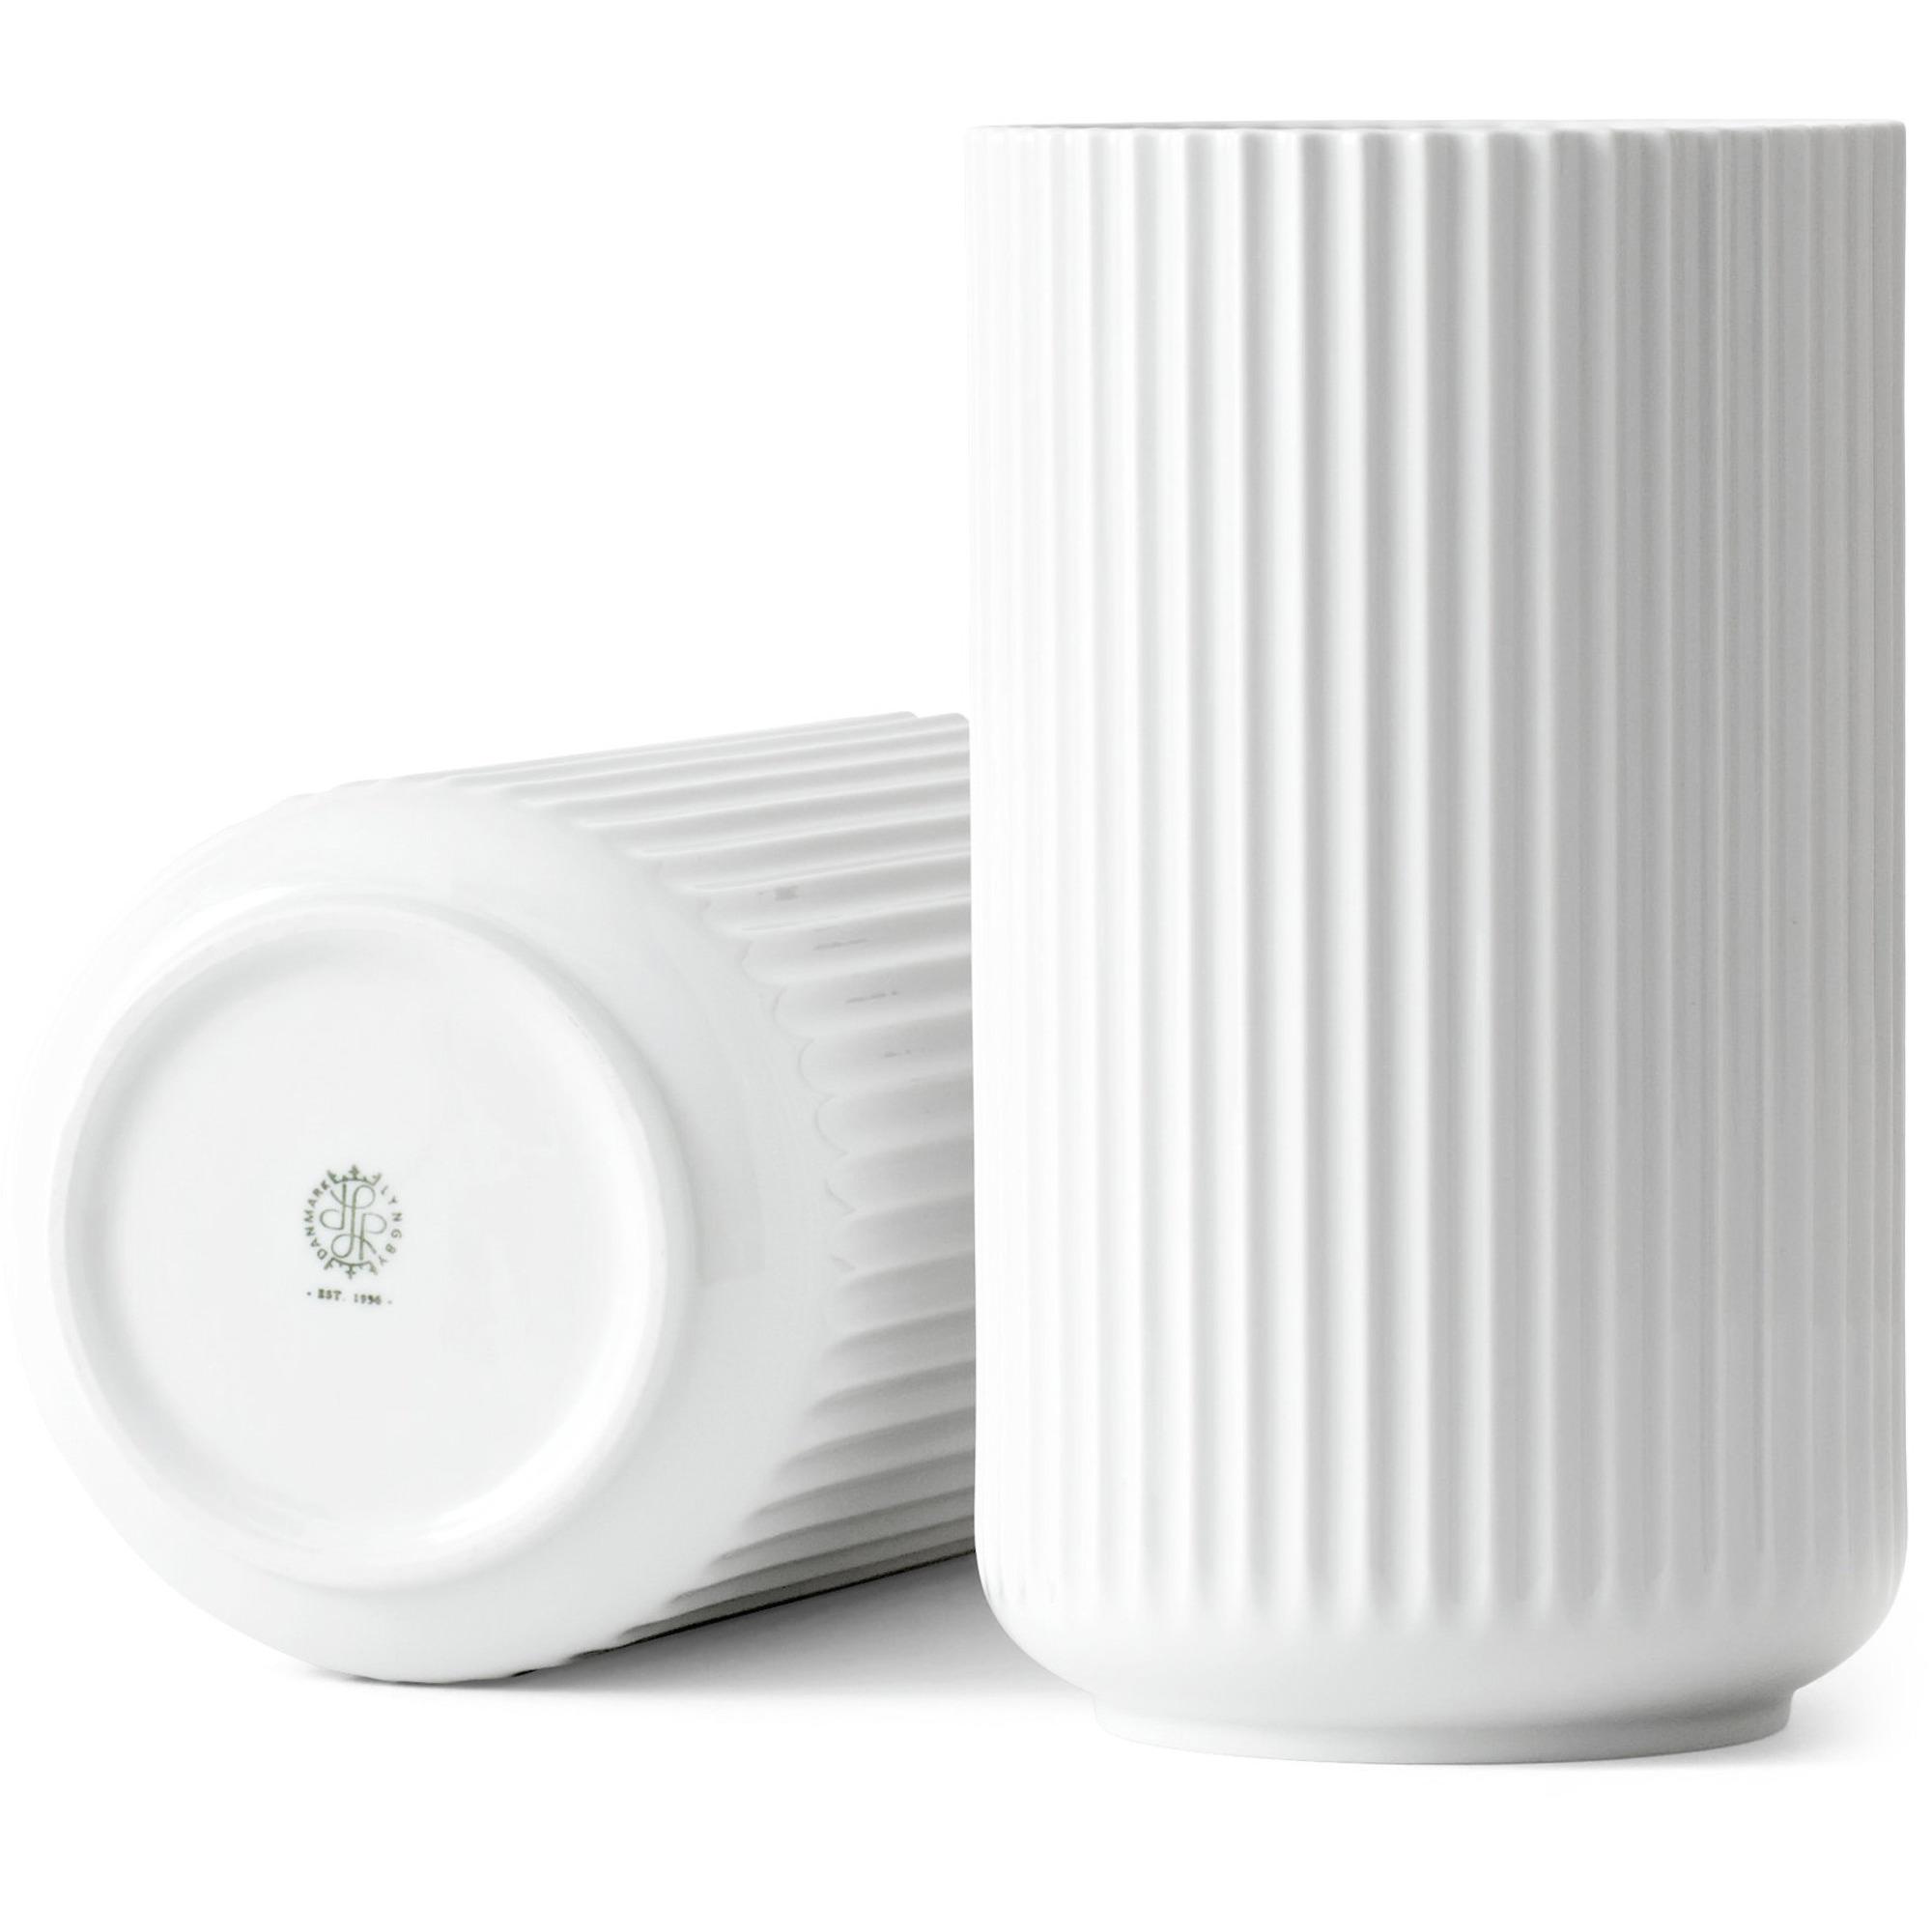 Lyngby Porcelæn Vas 25 cm Vit